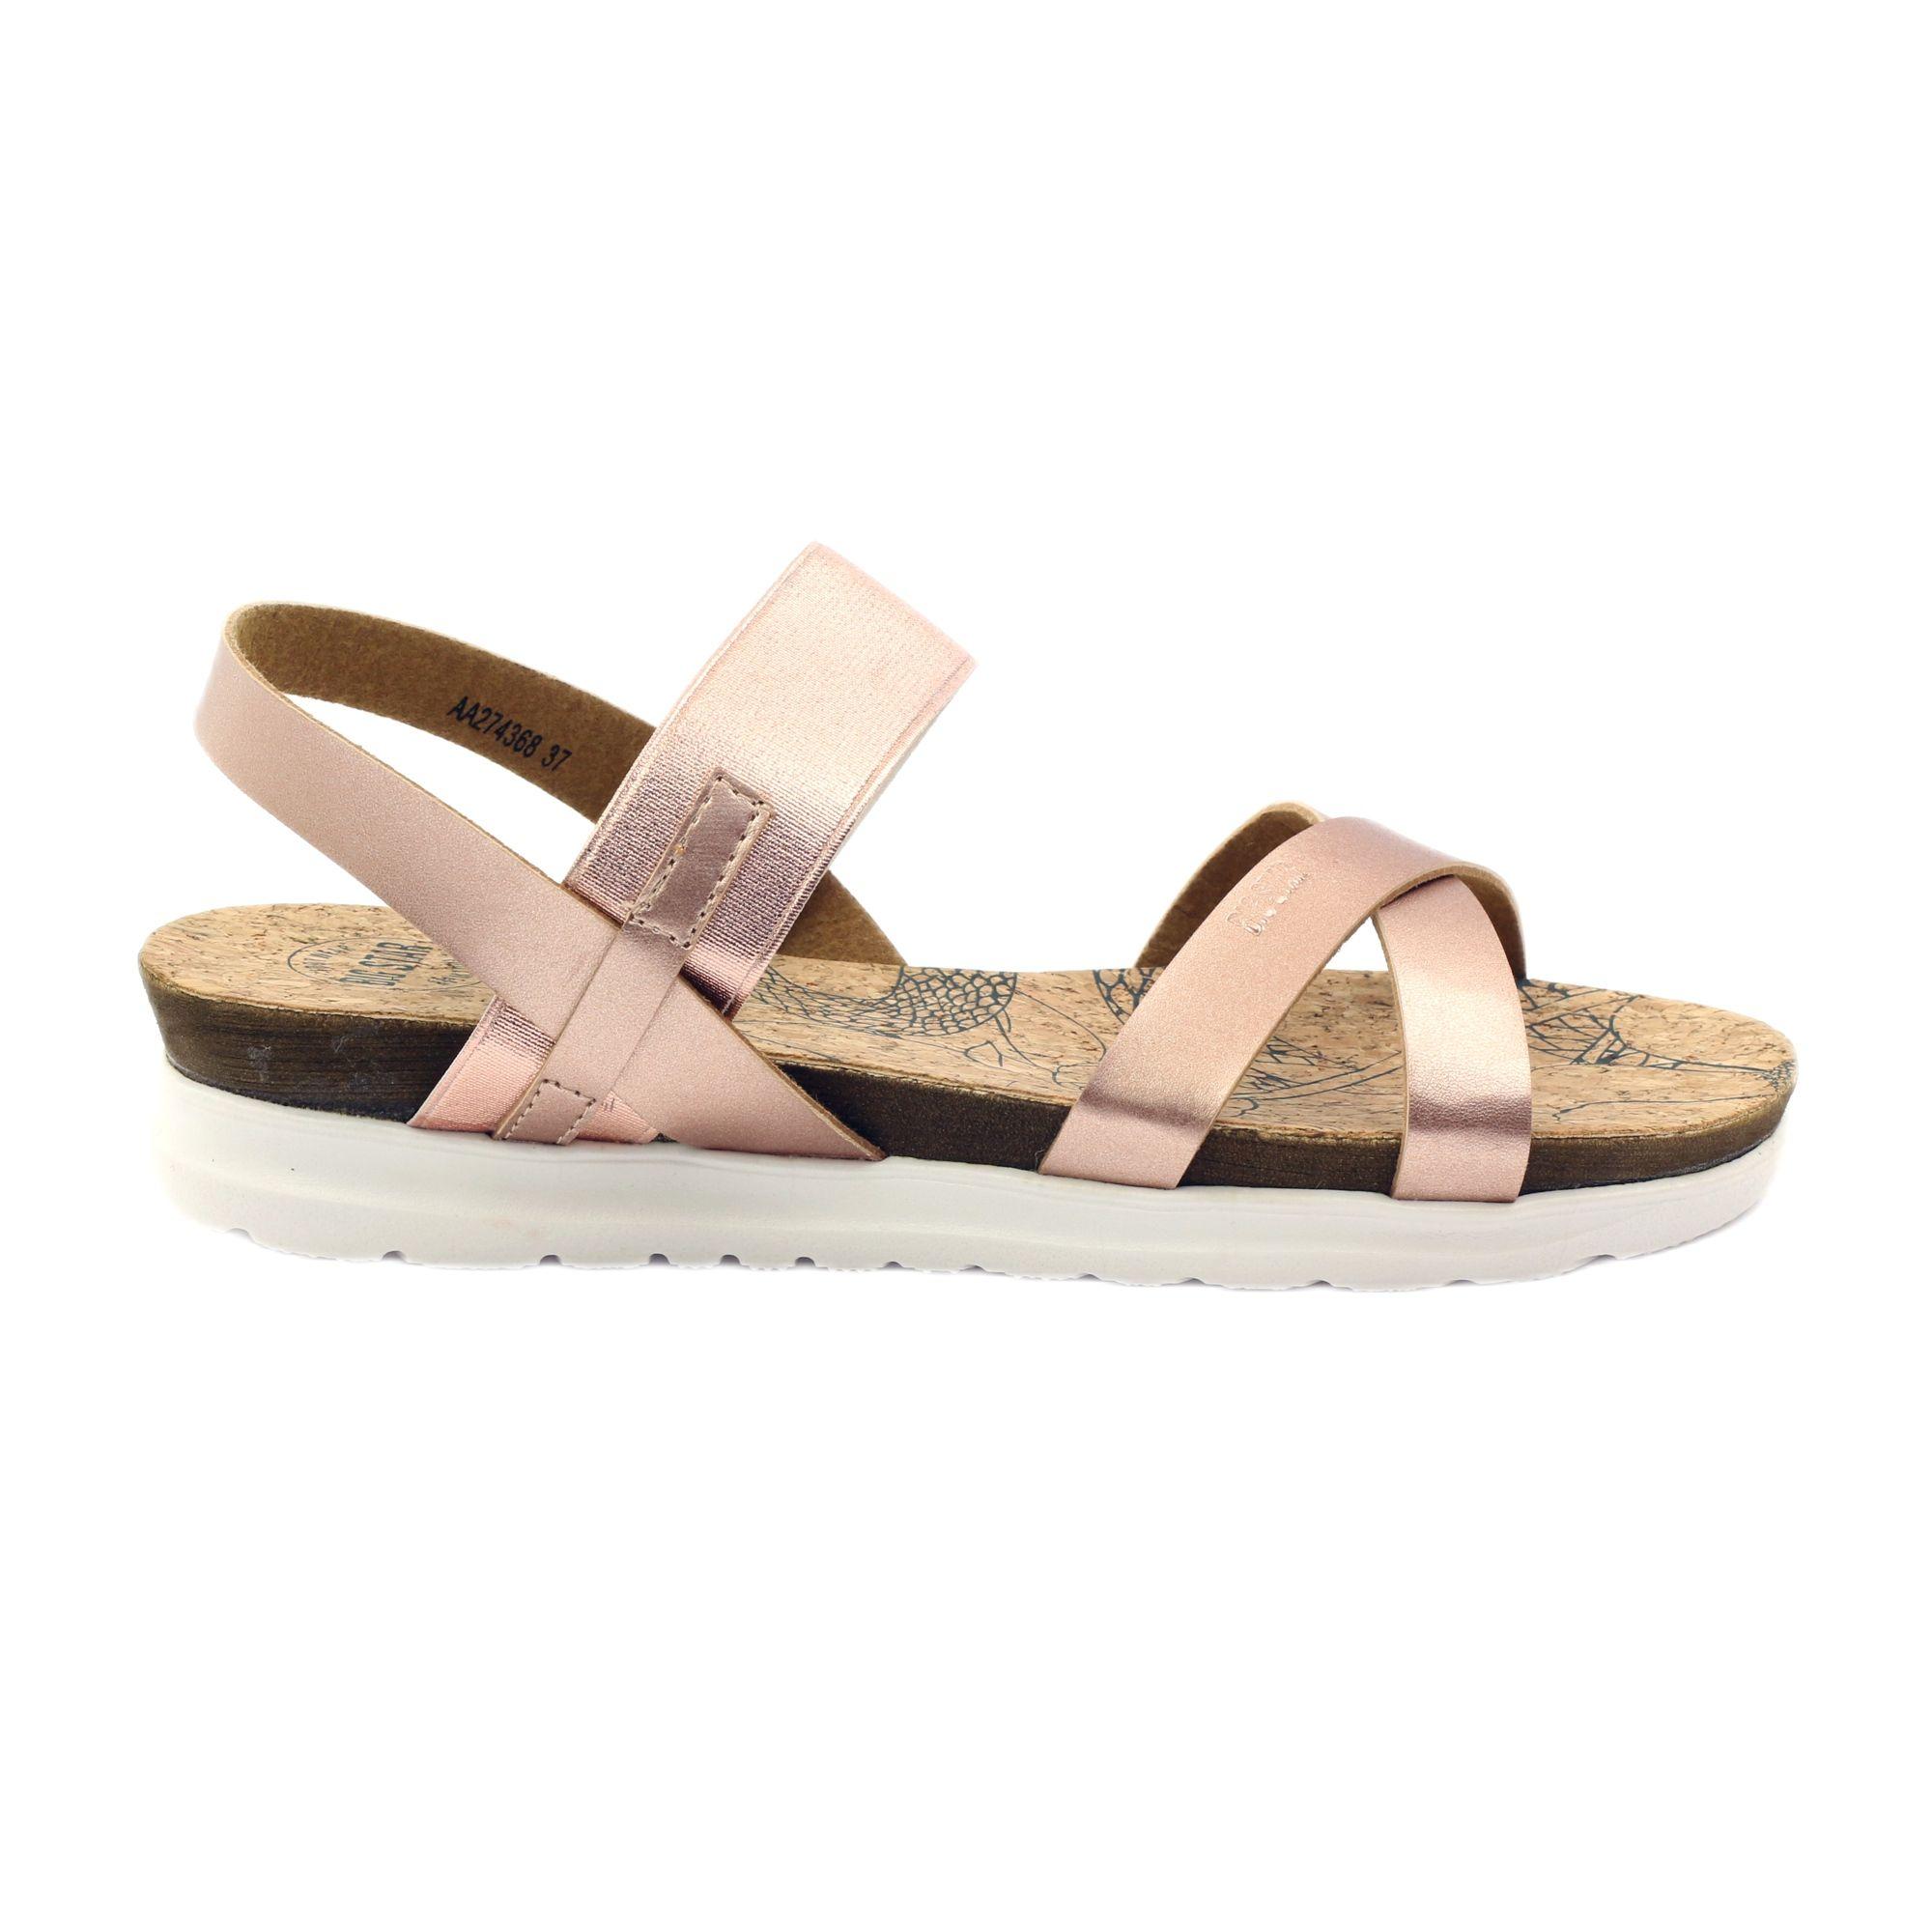 Sandaly Damskie Korek Big Star 274368 Rozowe Womens Sandals Sandals Star Shoes